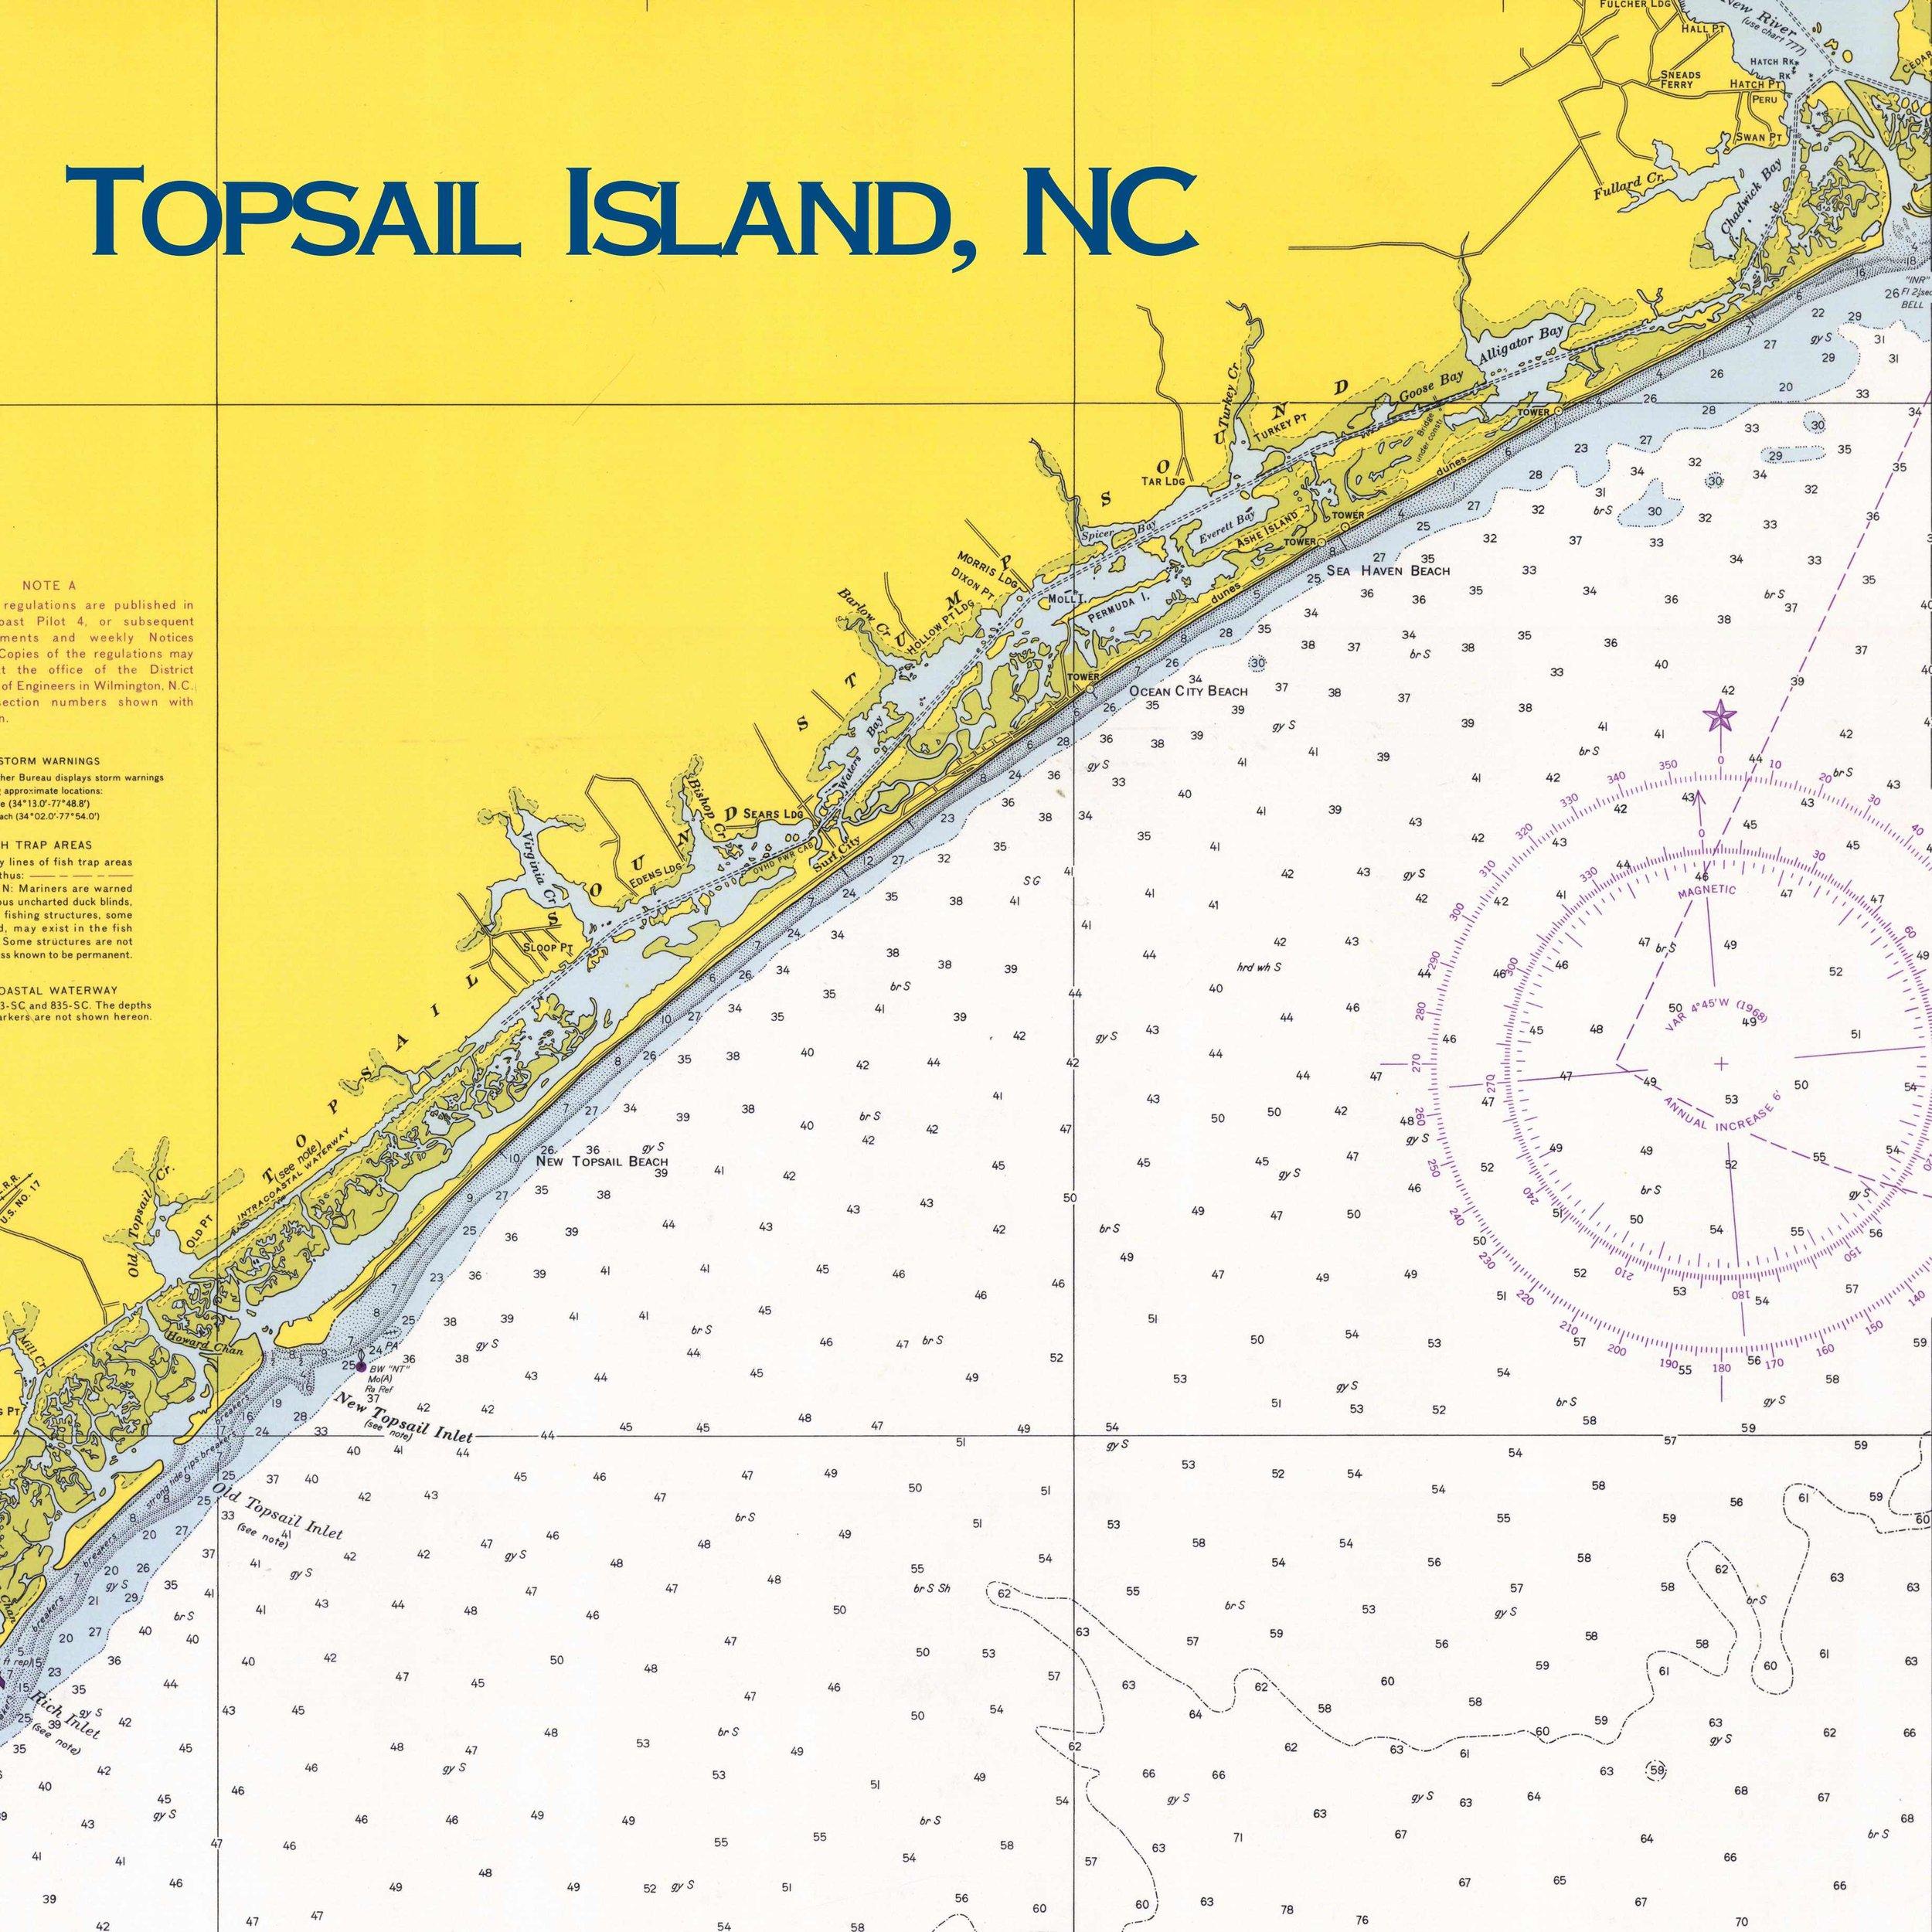 nautical chart 1235-08-1967-namedrop copy.jpg